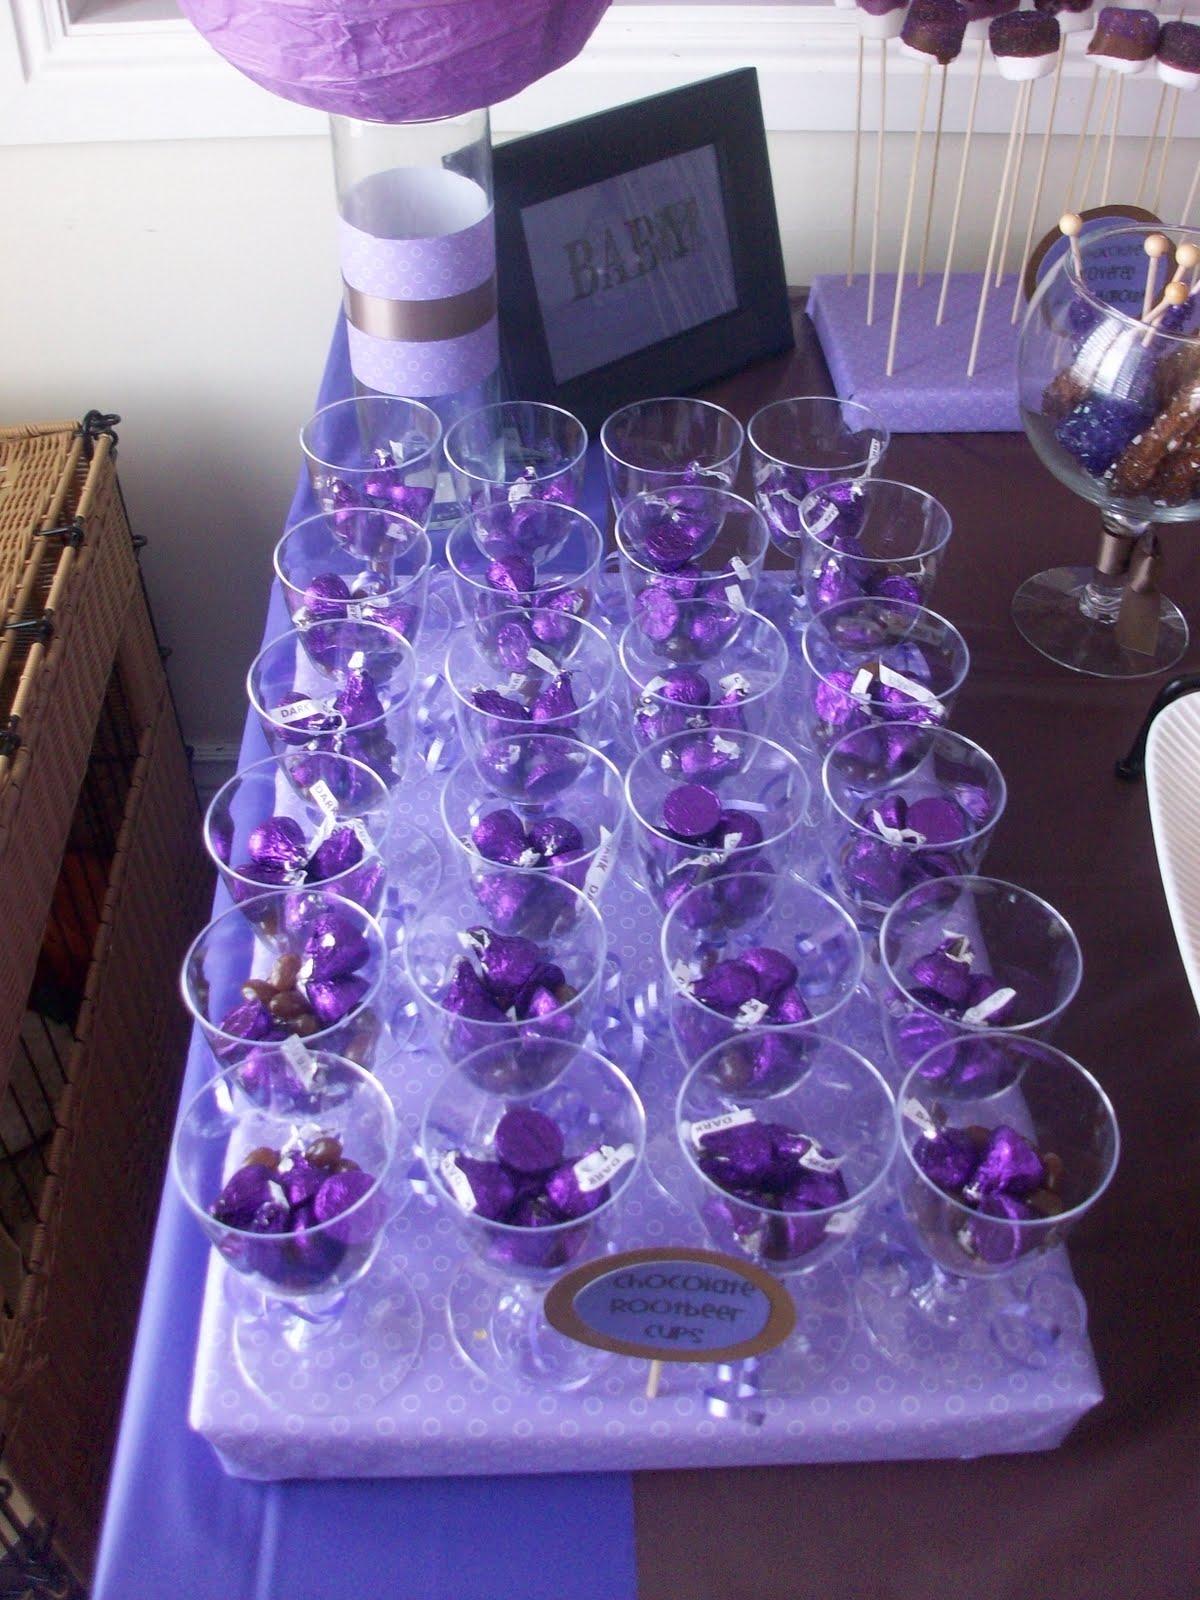 Sweete Parties Purple Brown Polka Dot Treat Table